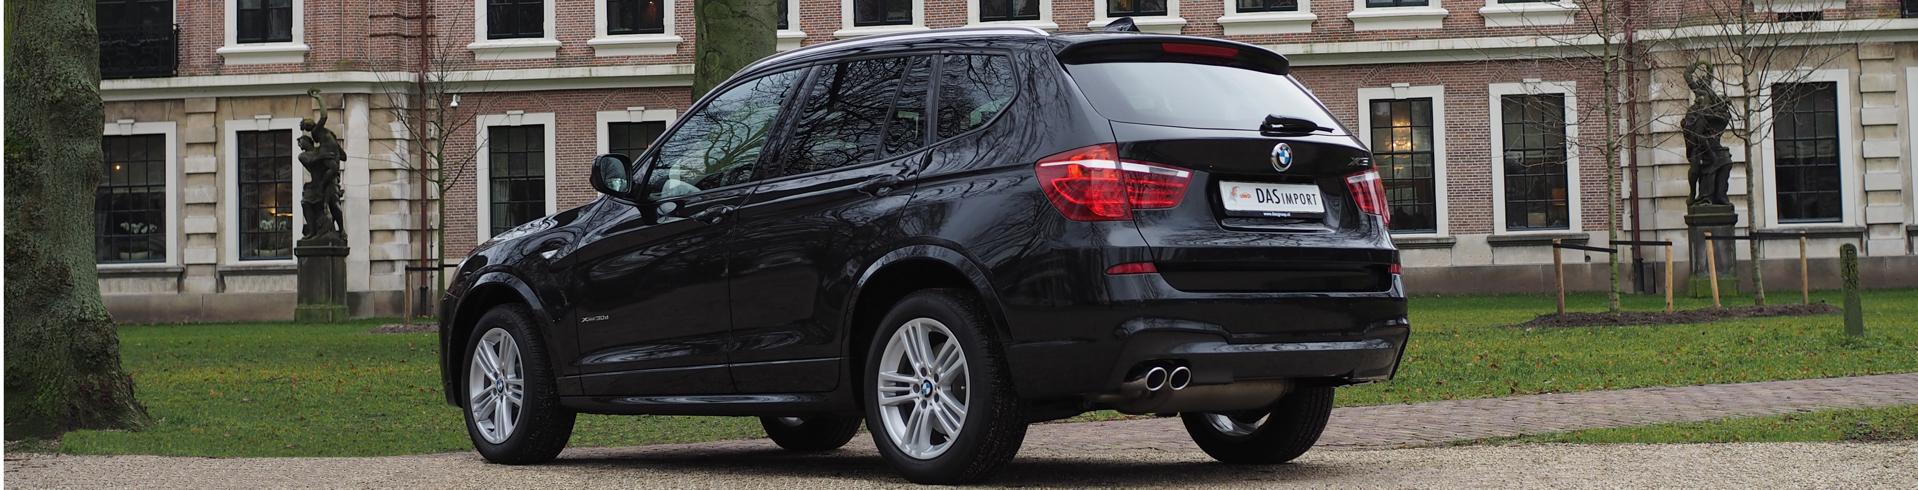 BMW-X3-uit-Duitsland